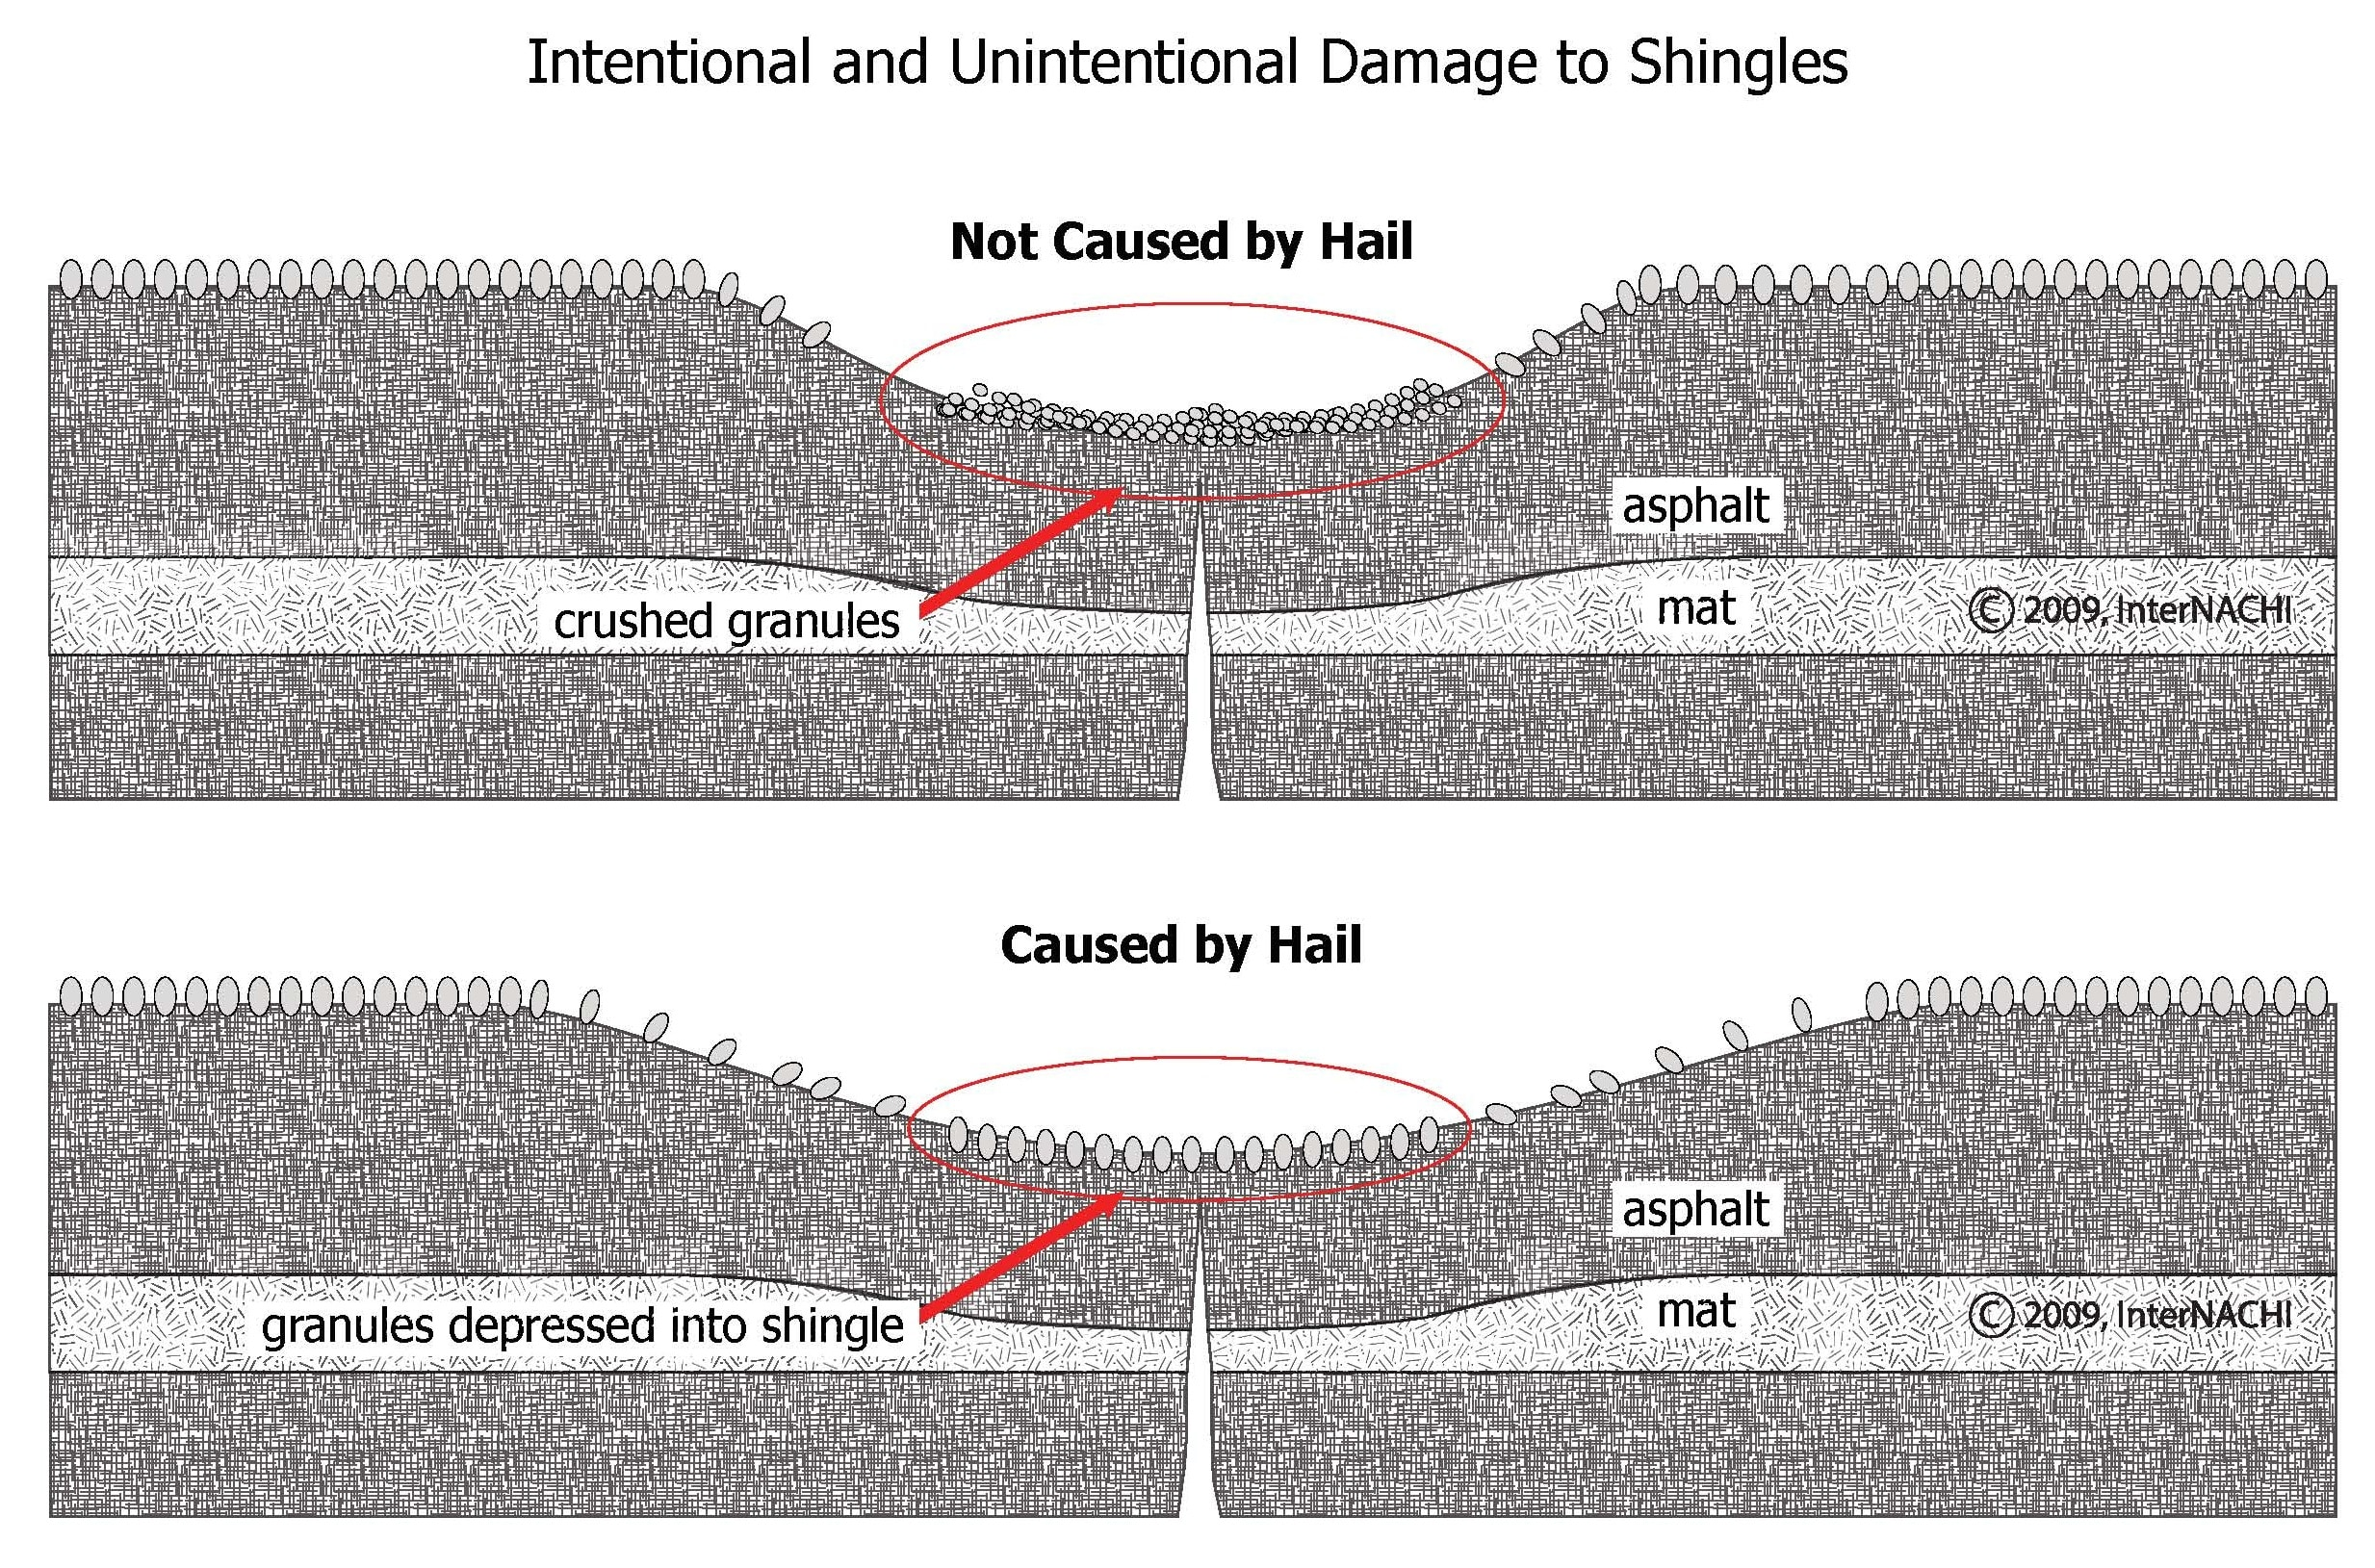 Intentional vs. unintentional damage.